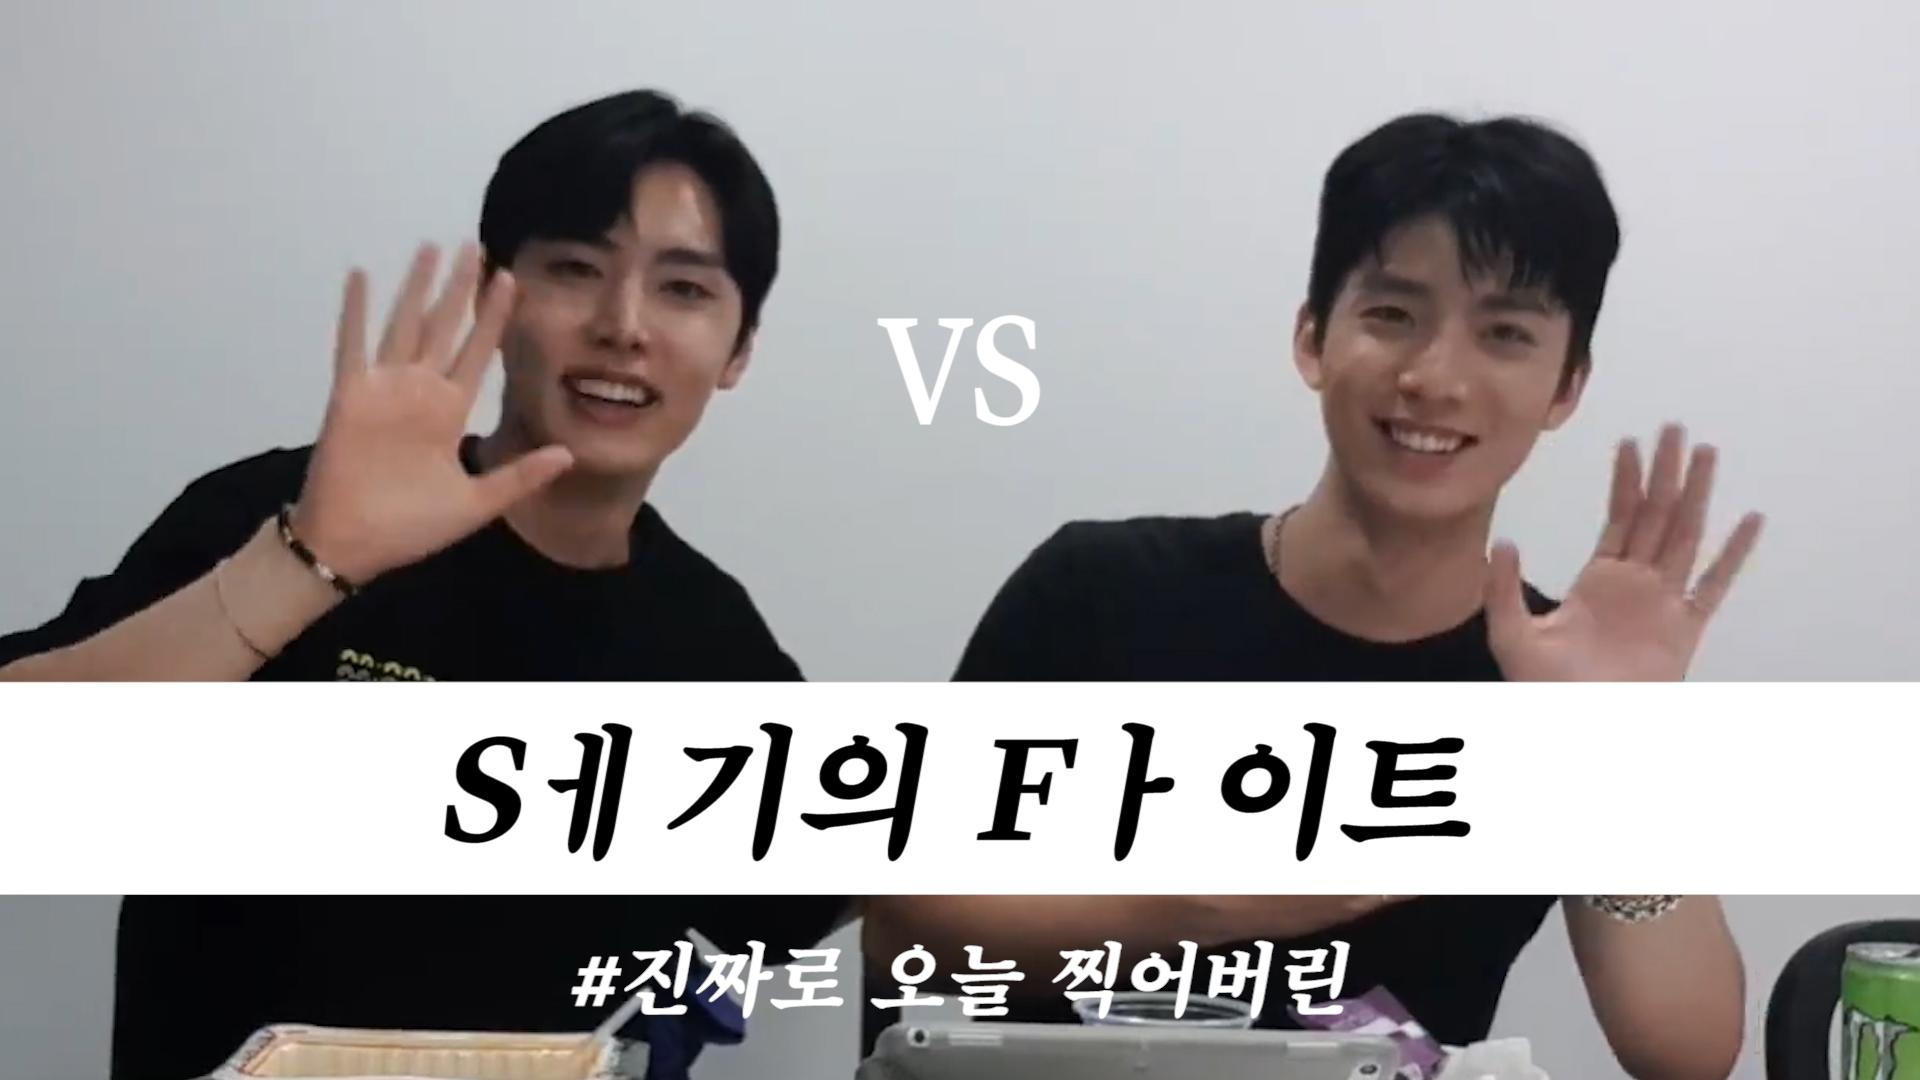 [SF9] 재윤&휘영's Sㅔ기의 (유치함) Fㅏ이트 -속편- (JAEYOON&HWIYOUNG fighting childishly)